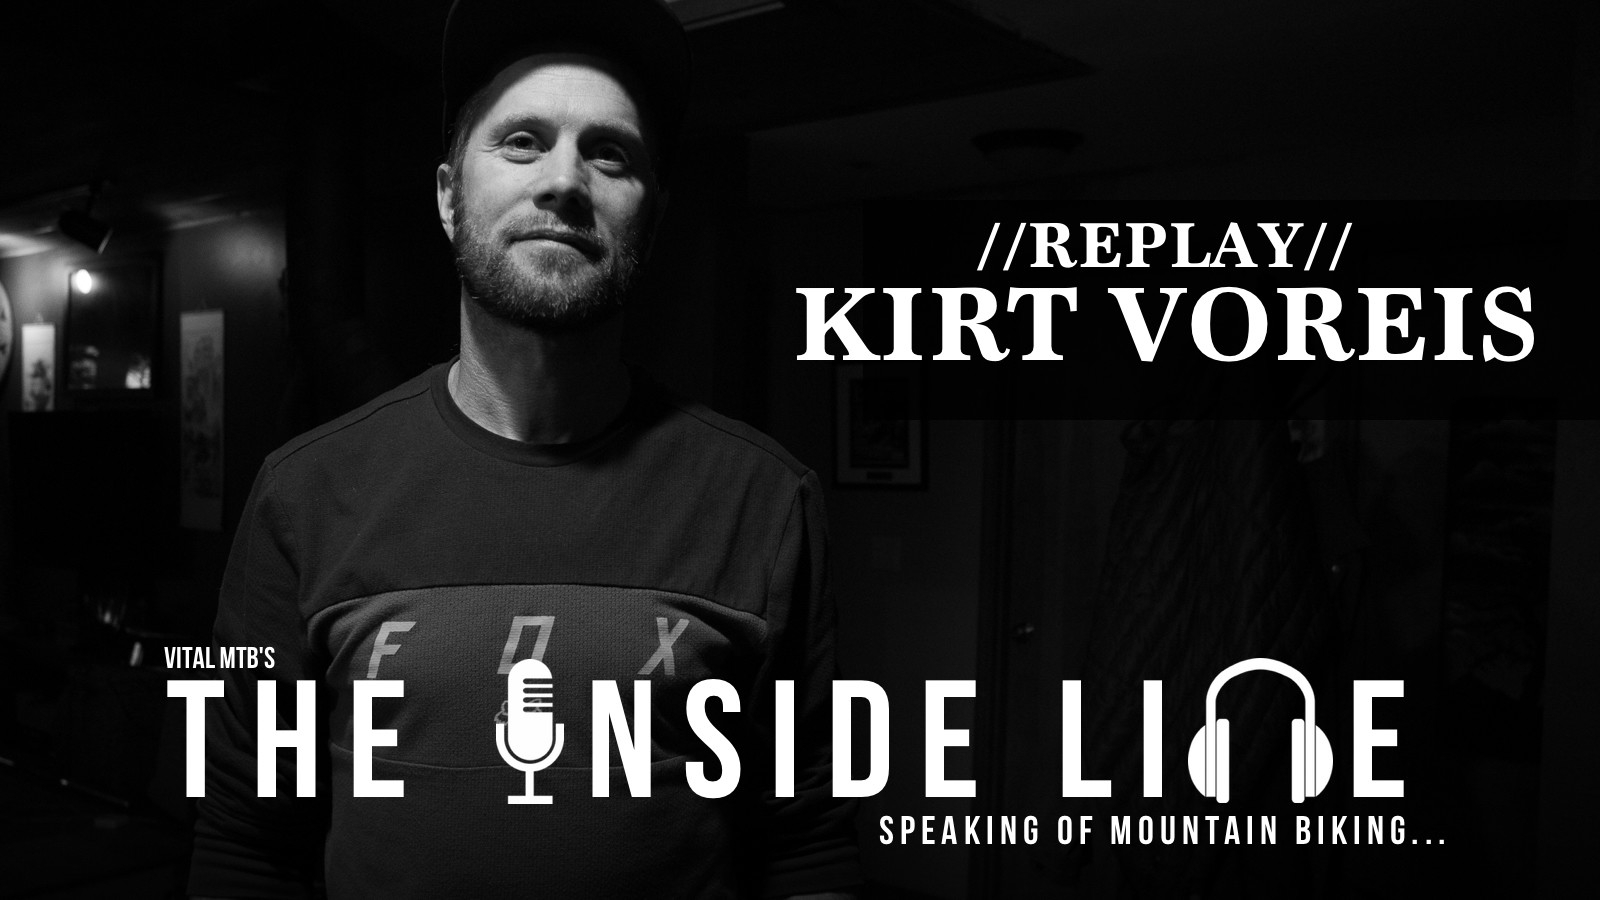 KIRT VOREIS - The Inside Line REPLAY